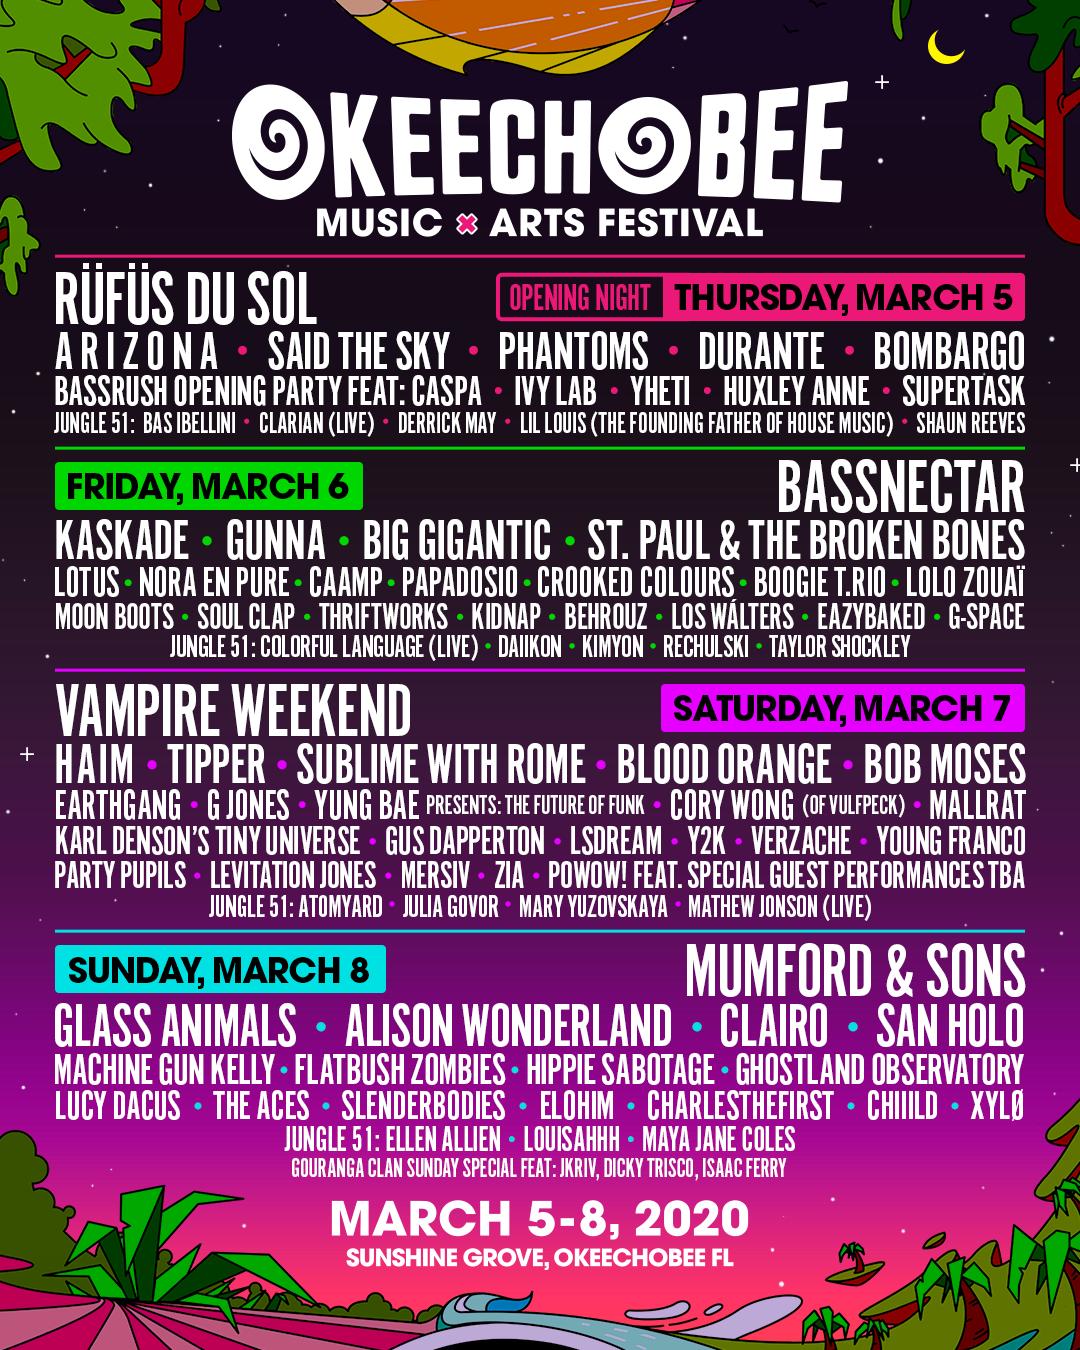 Okeechobee Music and Arts Festival 2020 lineup